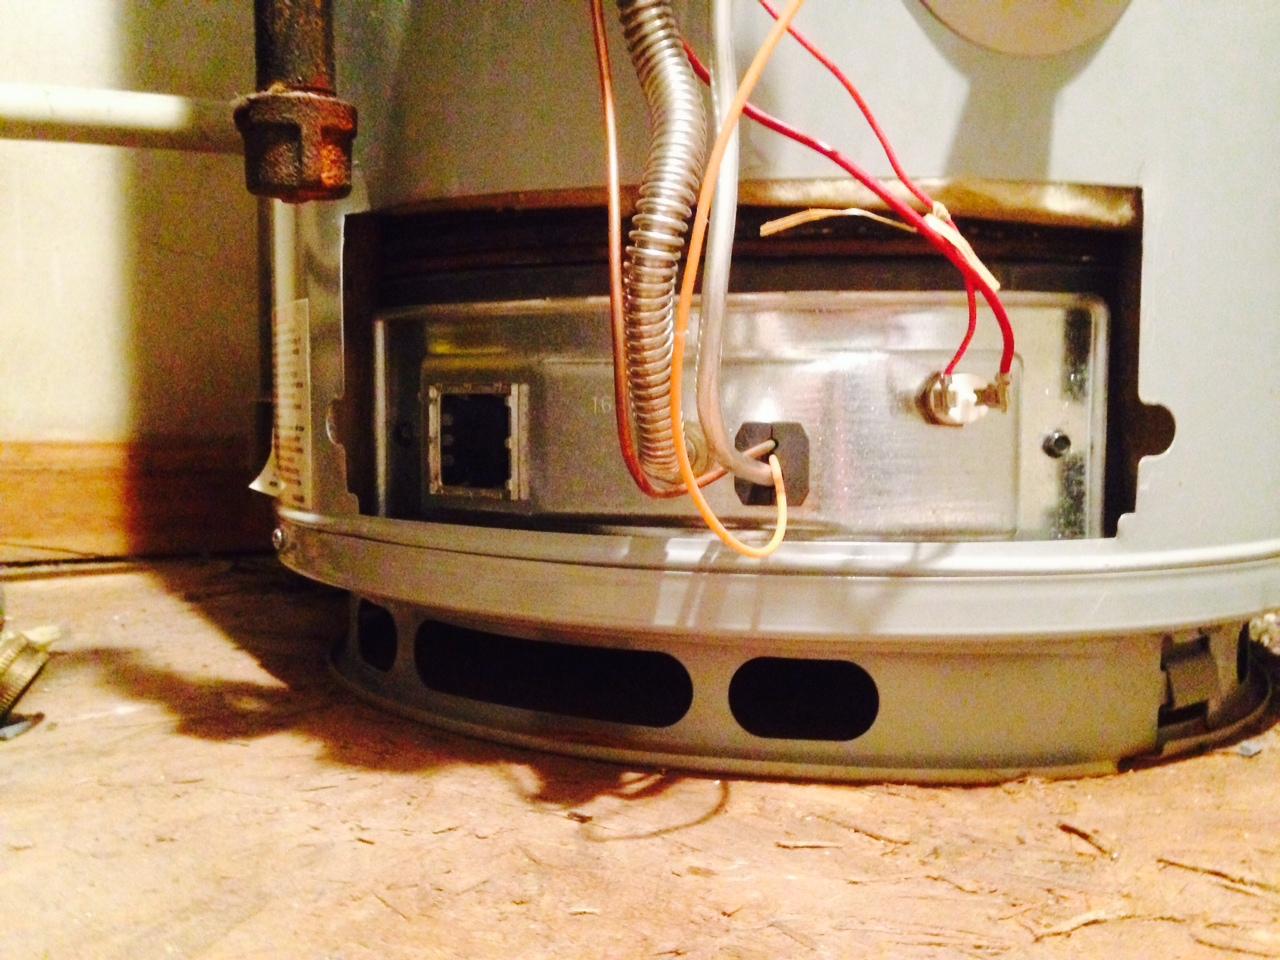 State Water Heater Repair Water Heaters Installed By